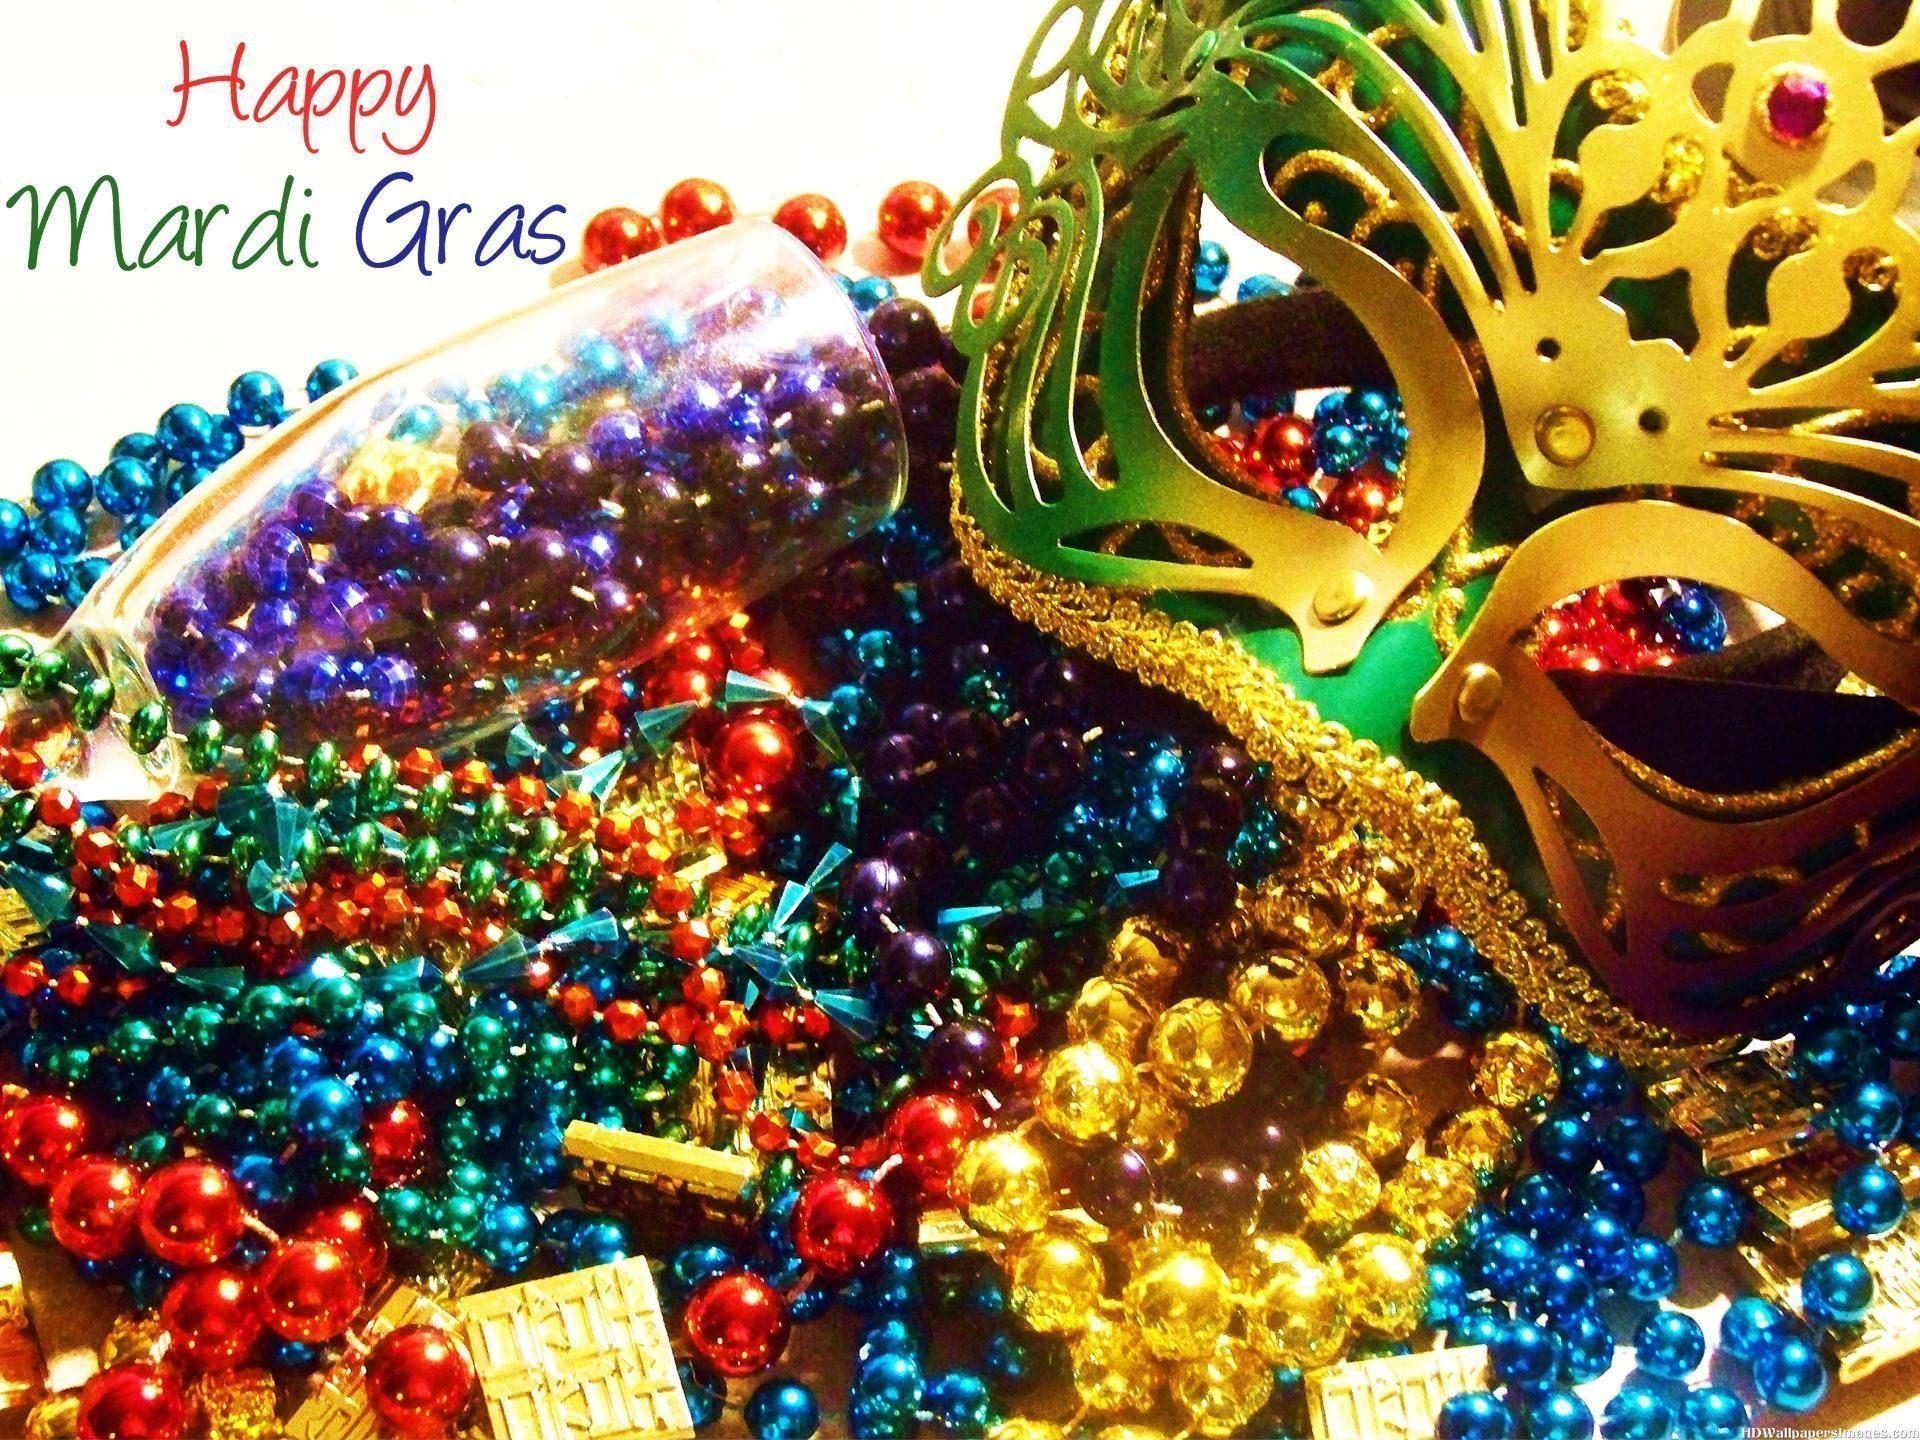 Mardi Gras Desktop Wallpapers 1920x1440